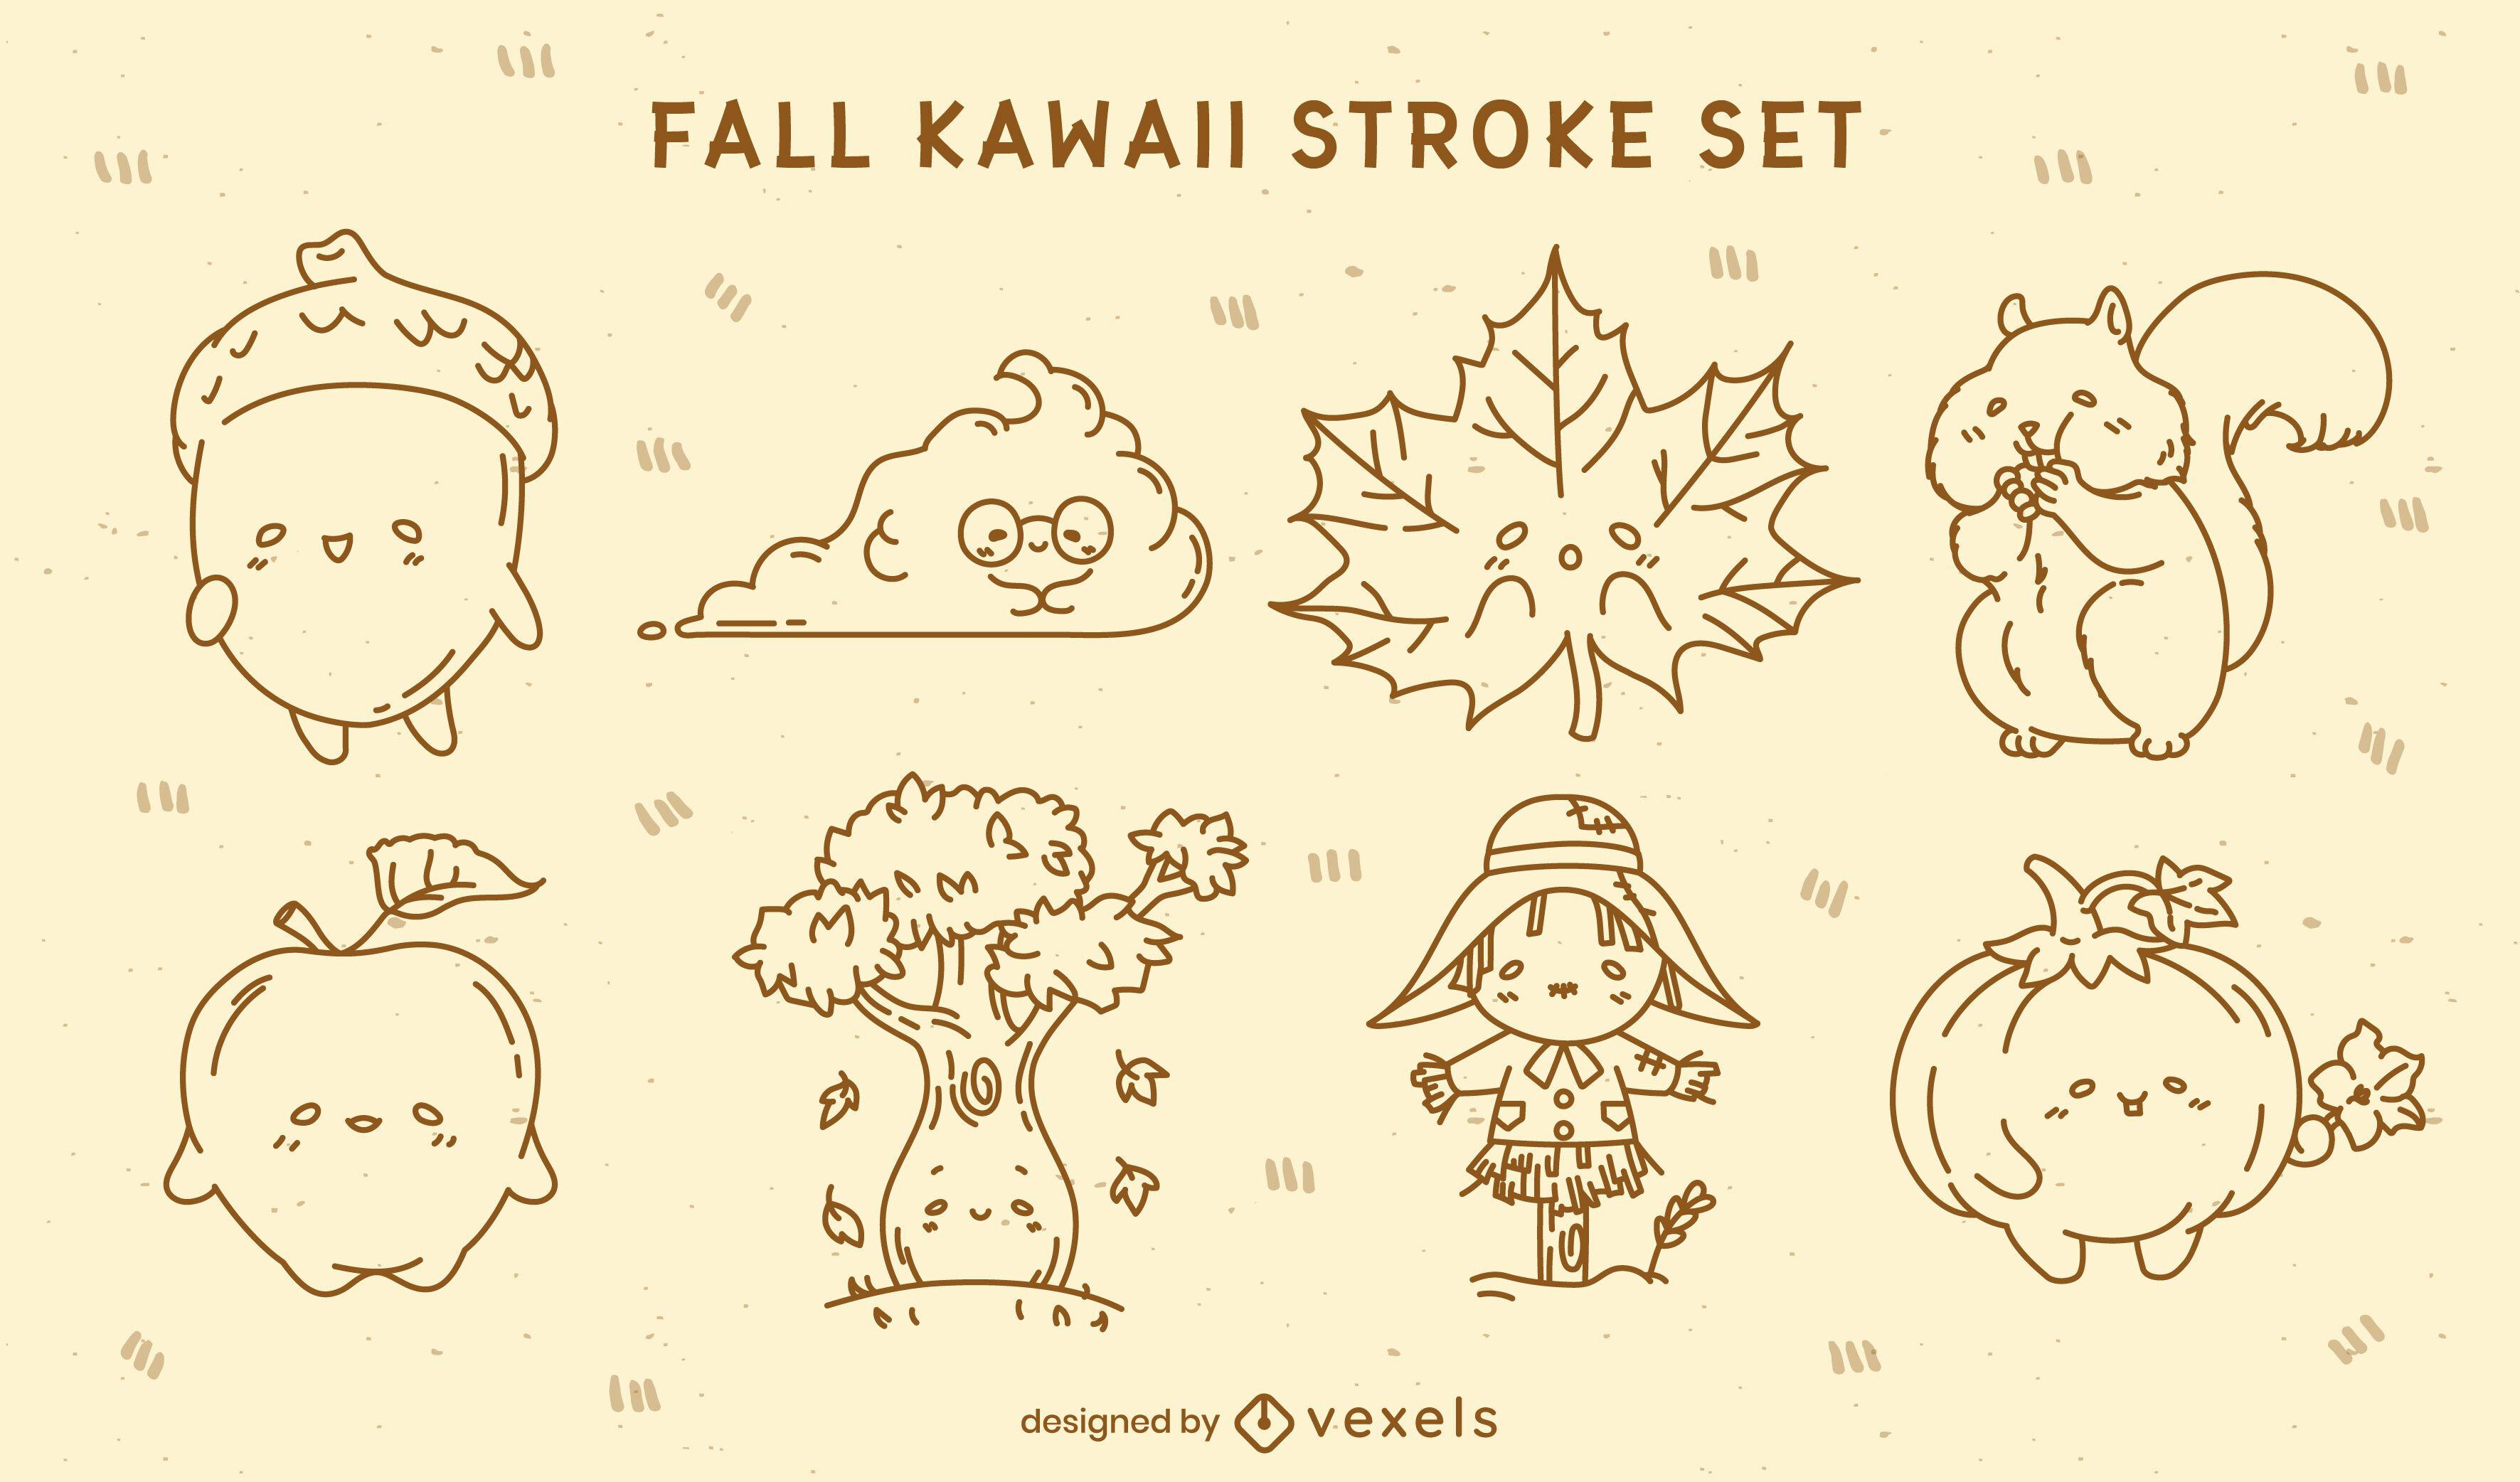 Kawaii autumn stroke characters set